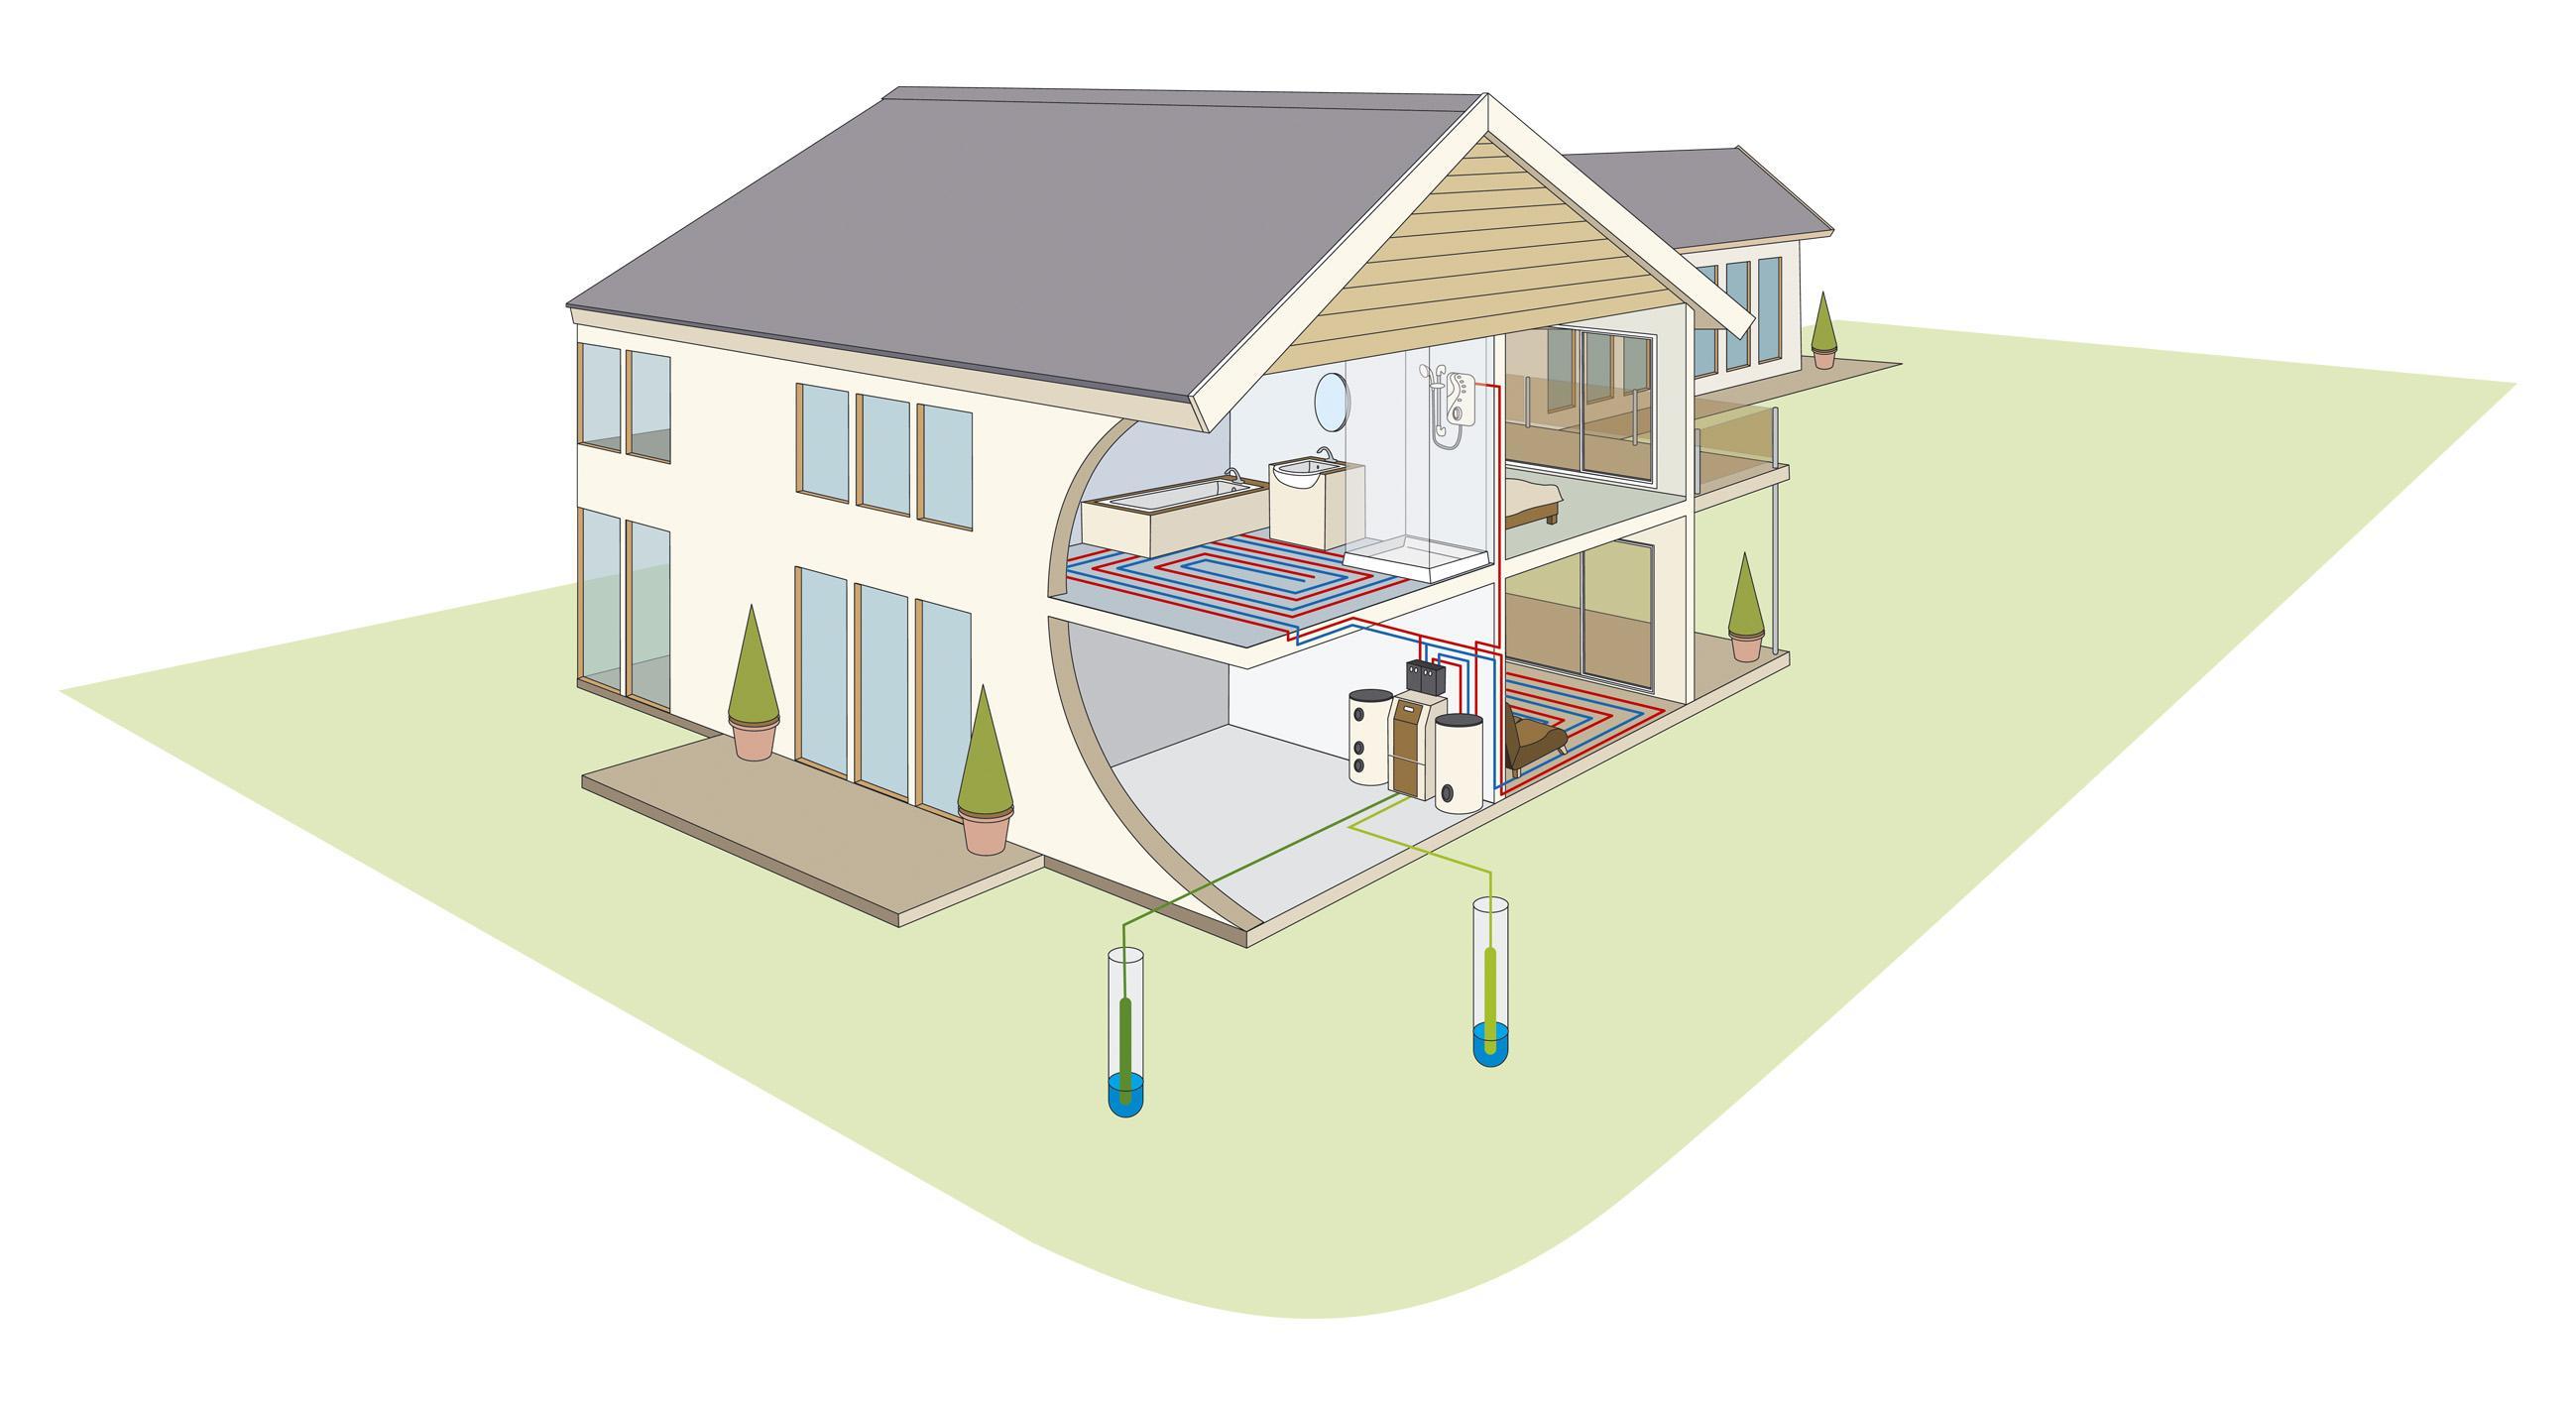 Table Air Energy Heat Pump Wiring Diagram Schematic Dimplex House Open Loop